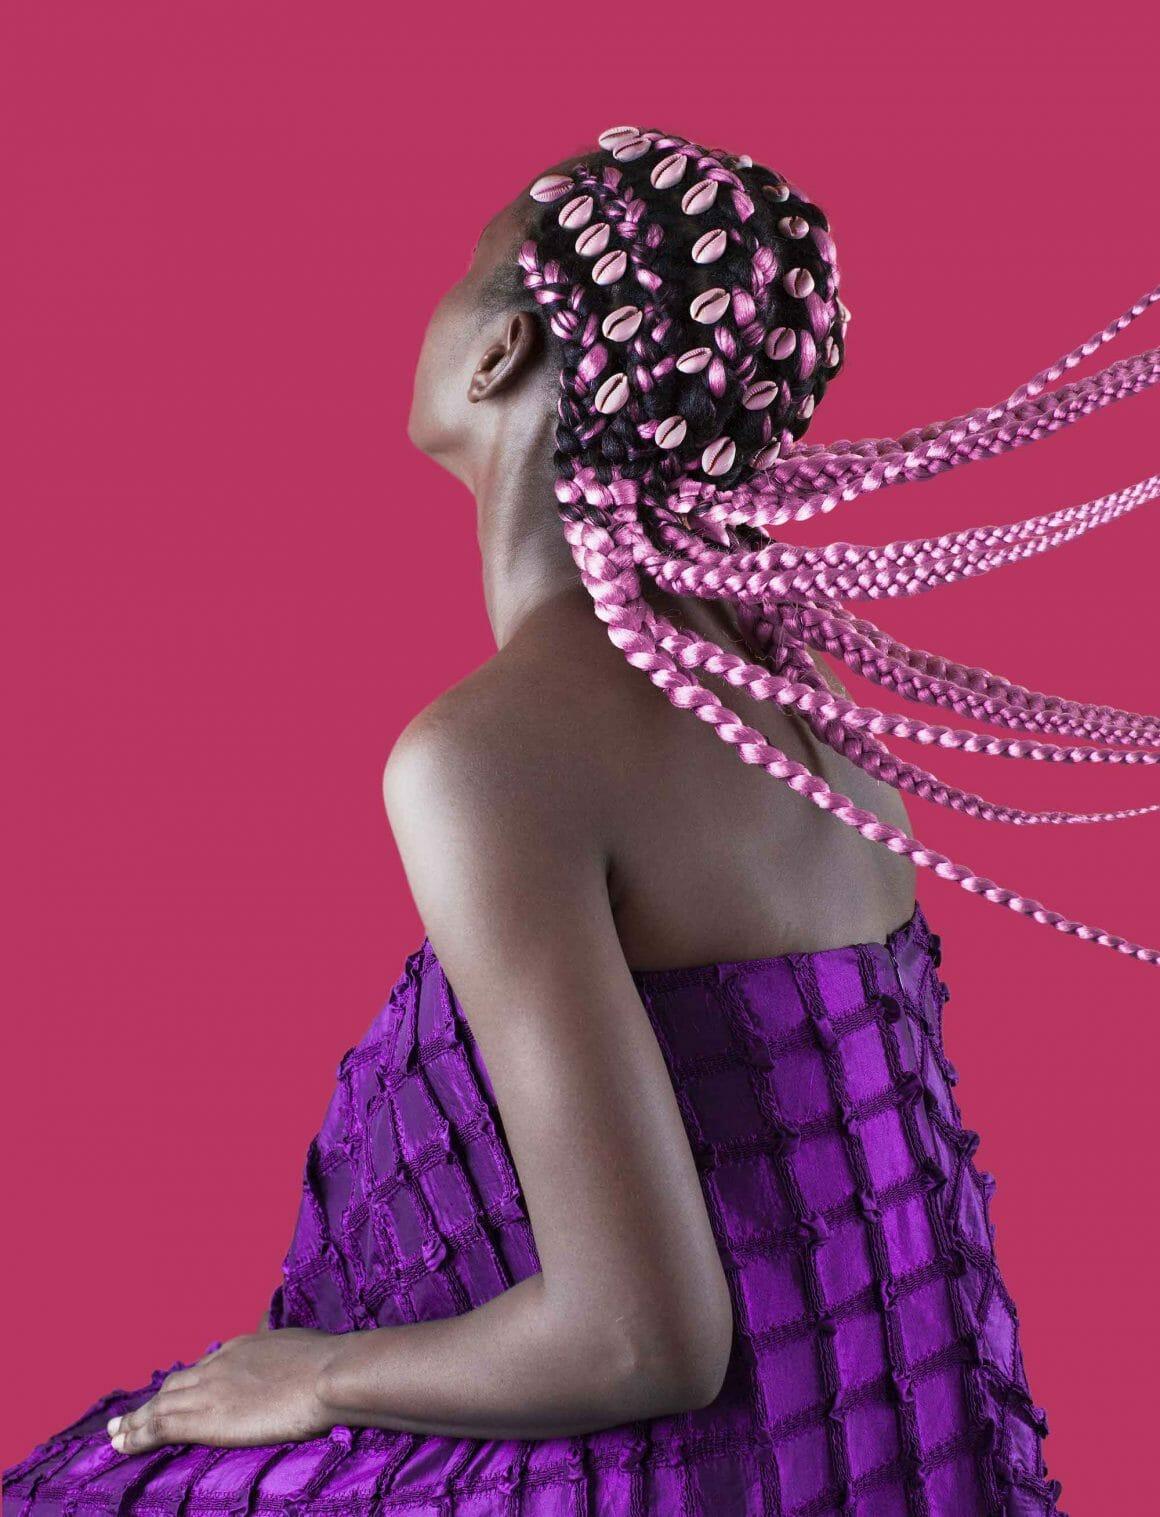 Pink Didi with Cowry Shell photographie de coiffure nigeriane par Medina Dugger